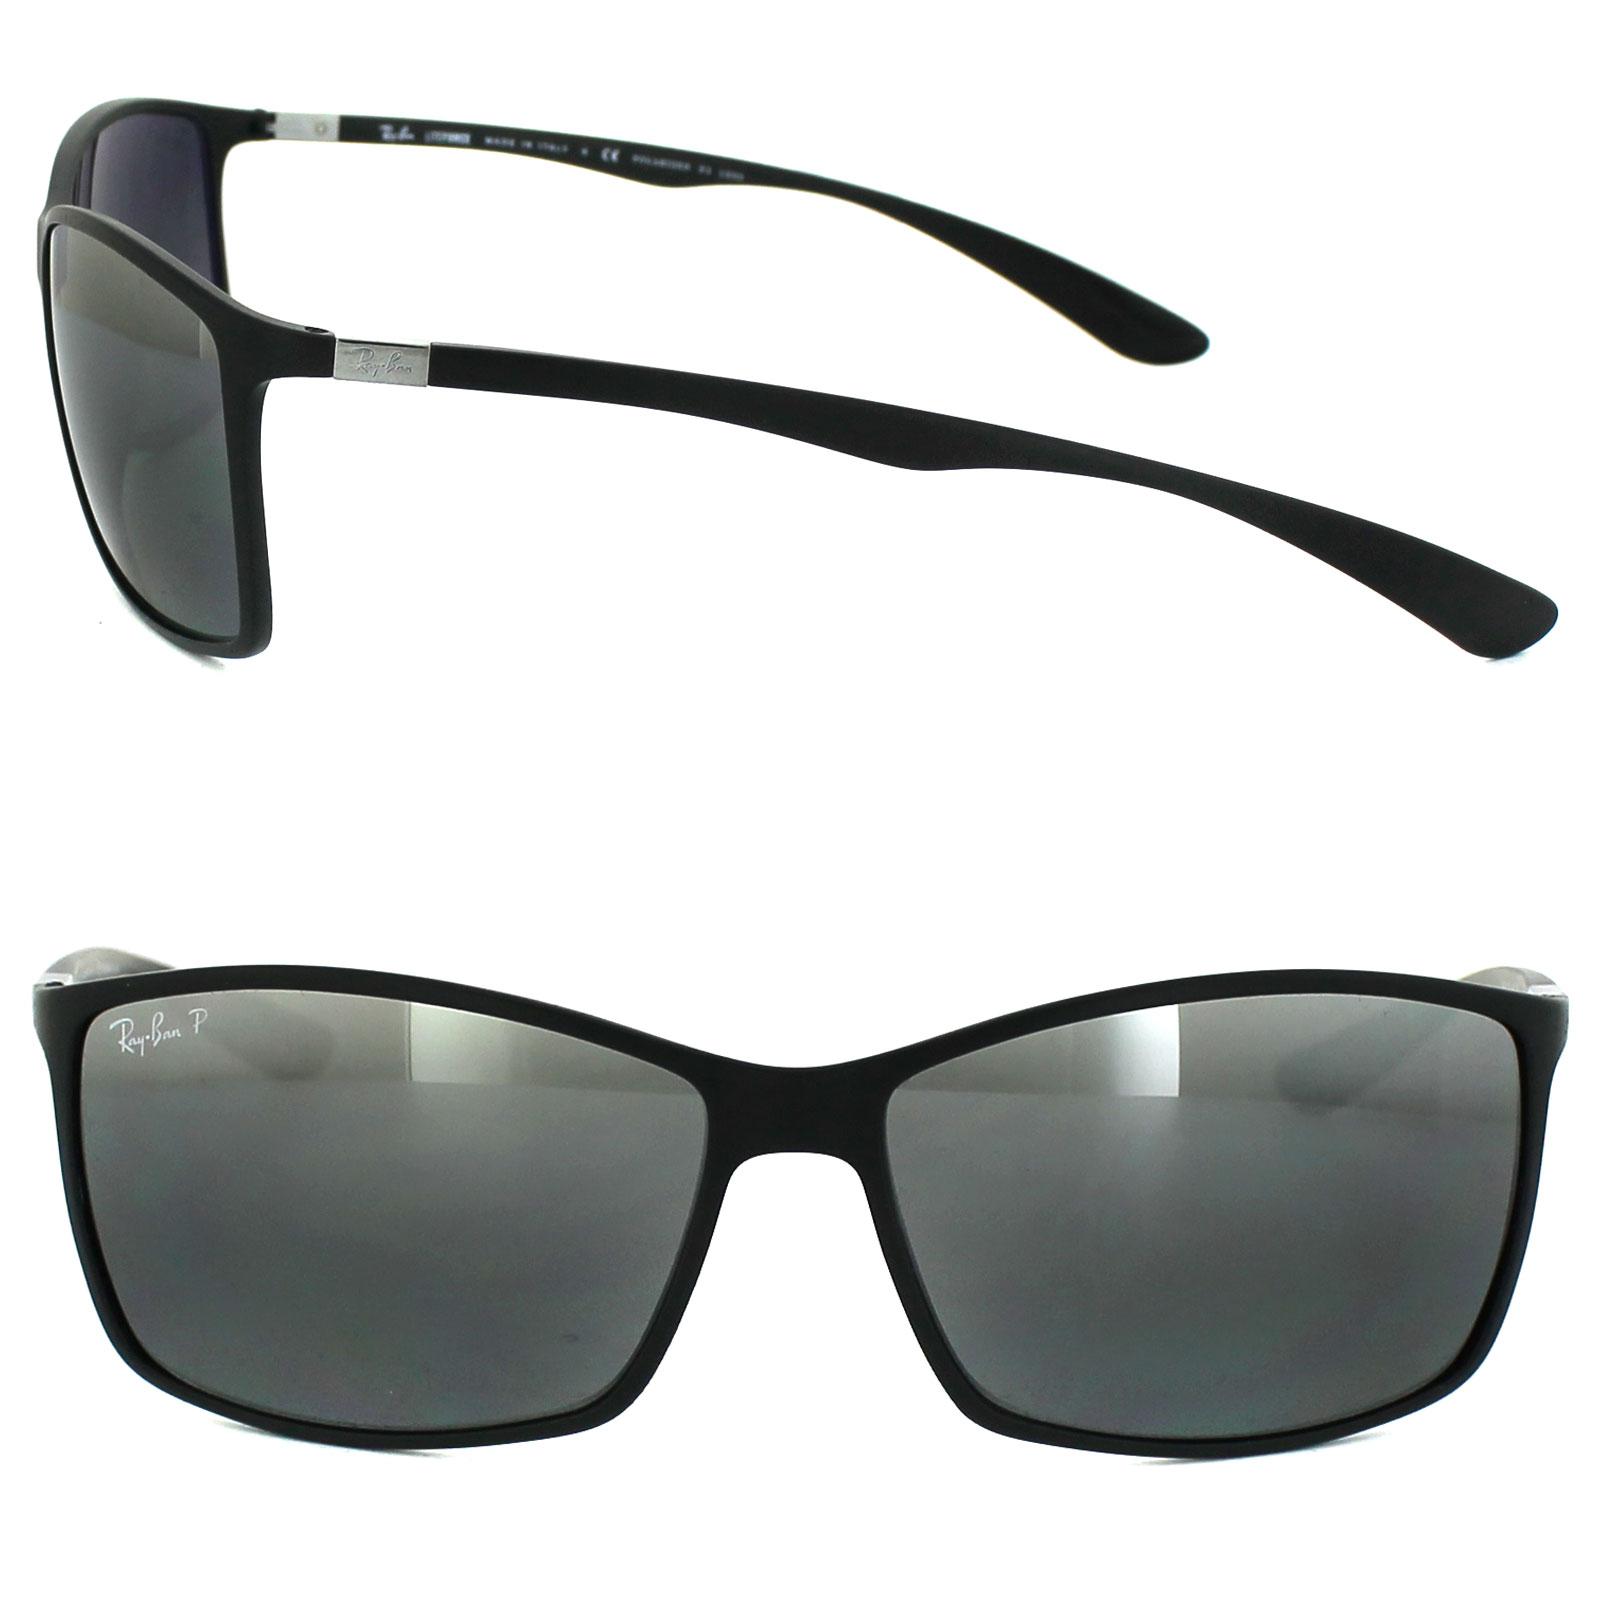 f8f7063a793 CENTINELA Ray-Ban gafas de sol 4179 601S82 espejo plata negro polarizado